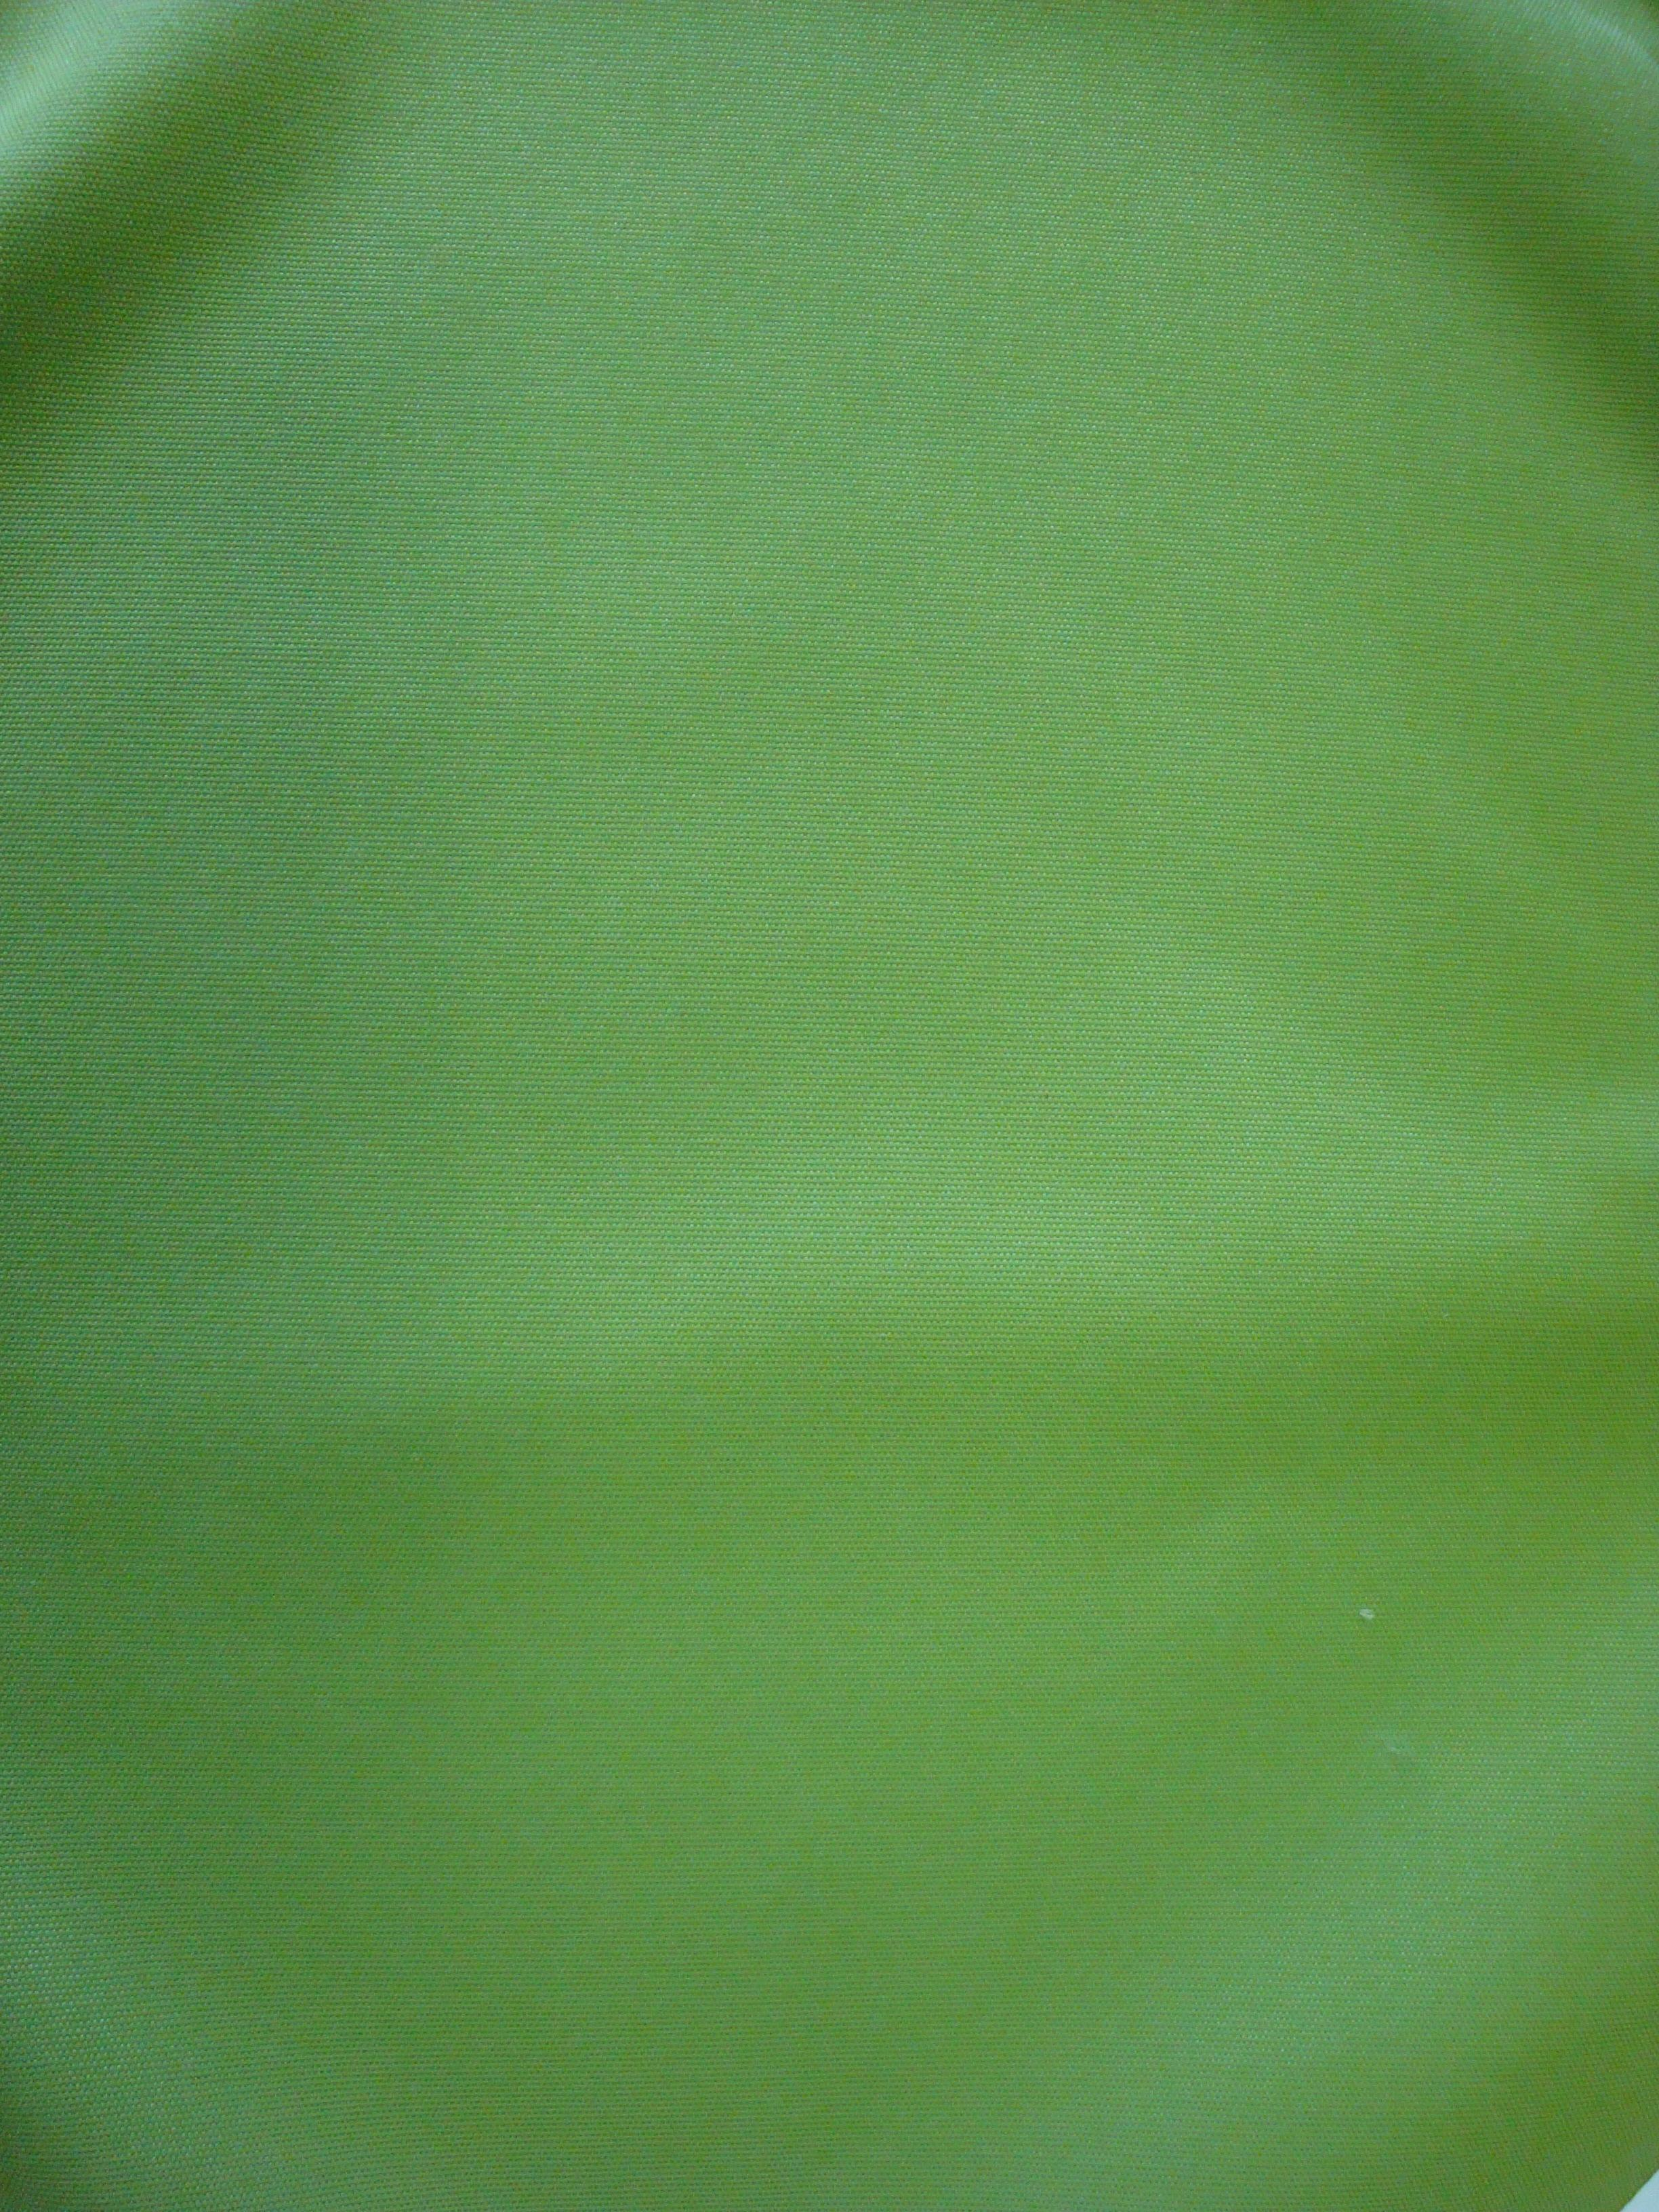 Antigua Dining Armchair in Royal Oak-Fabric:Green by Boca Rattan